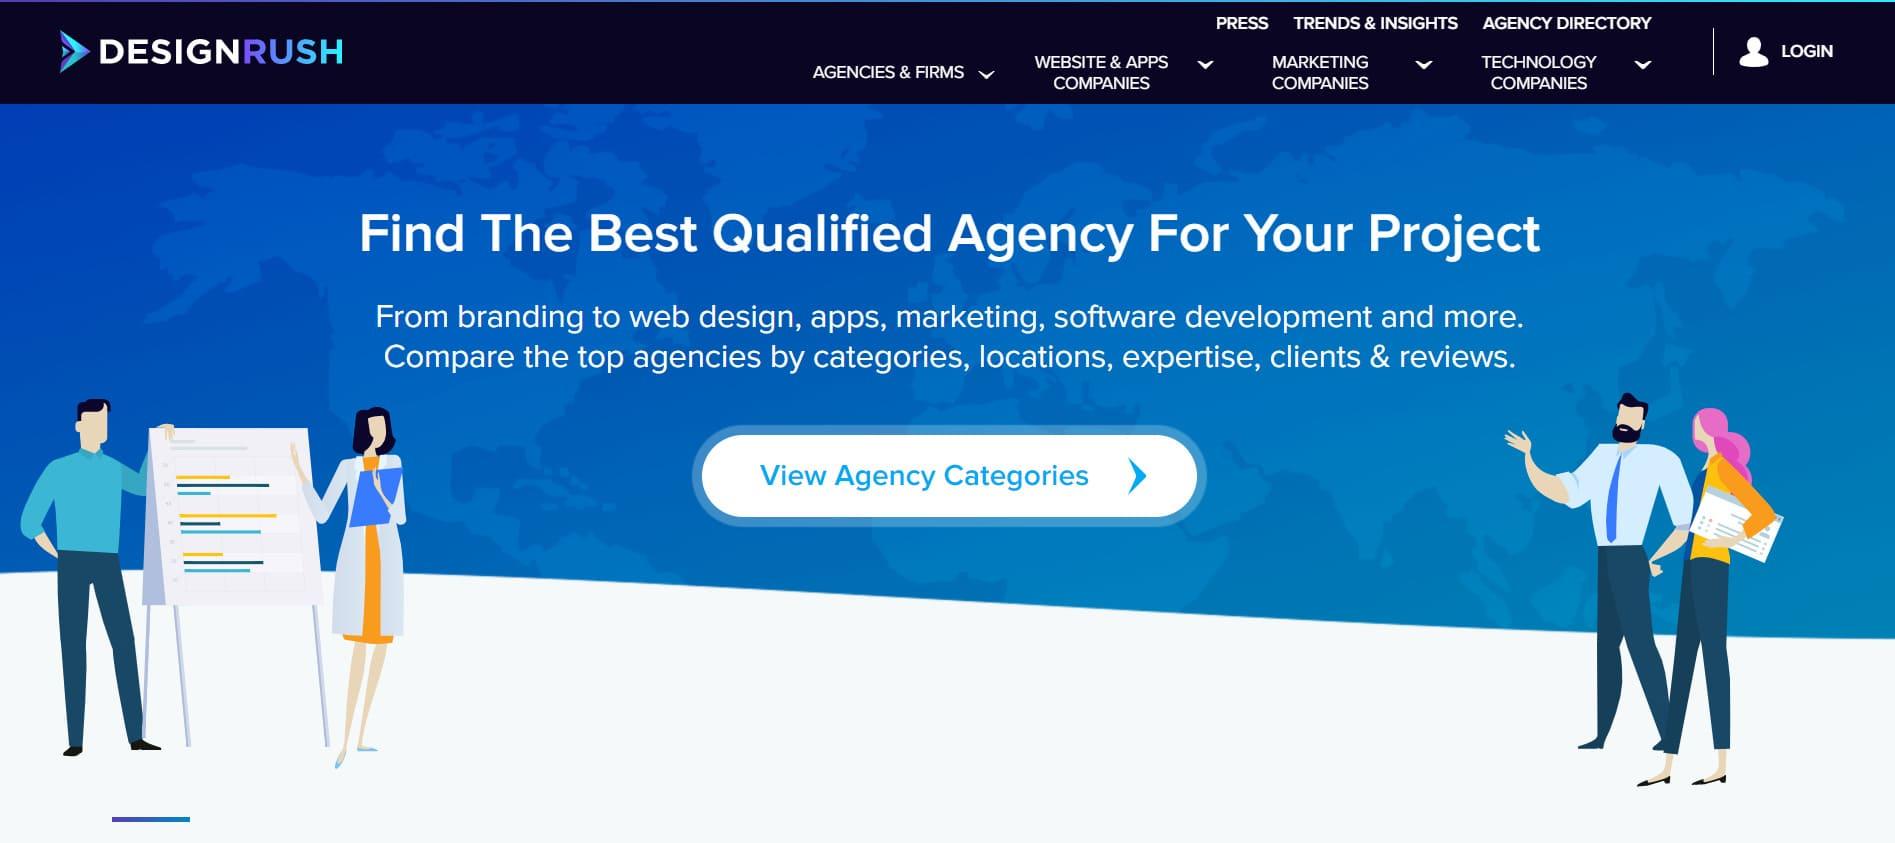 DesignRush Homepage